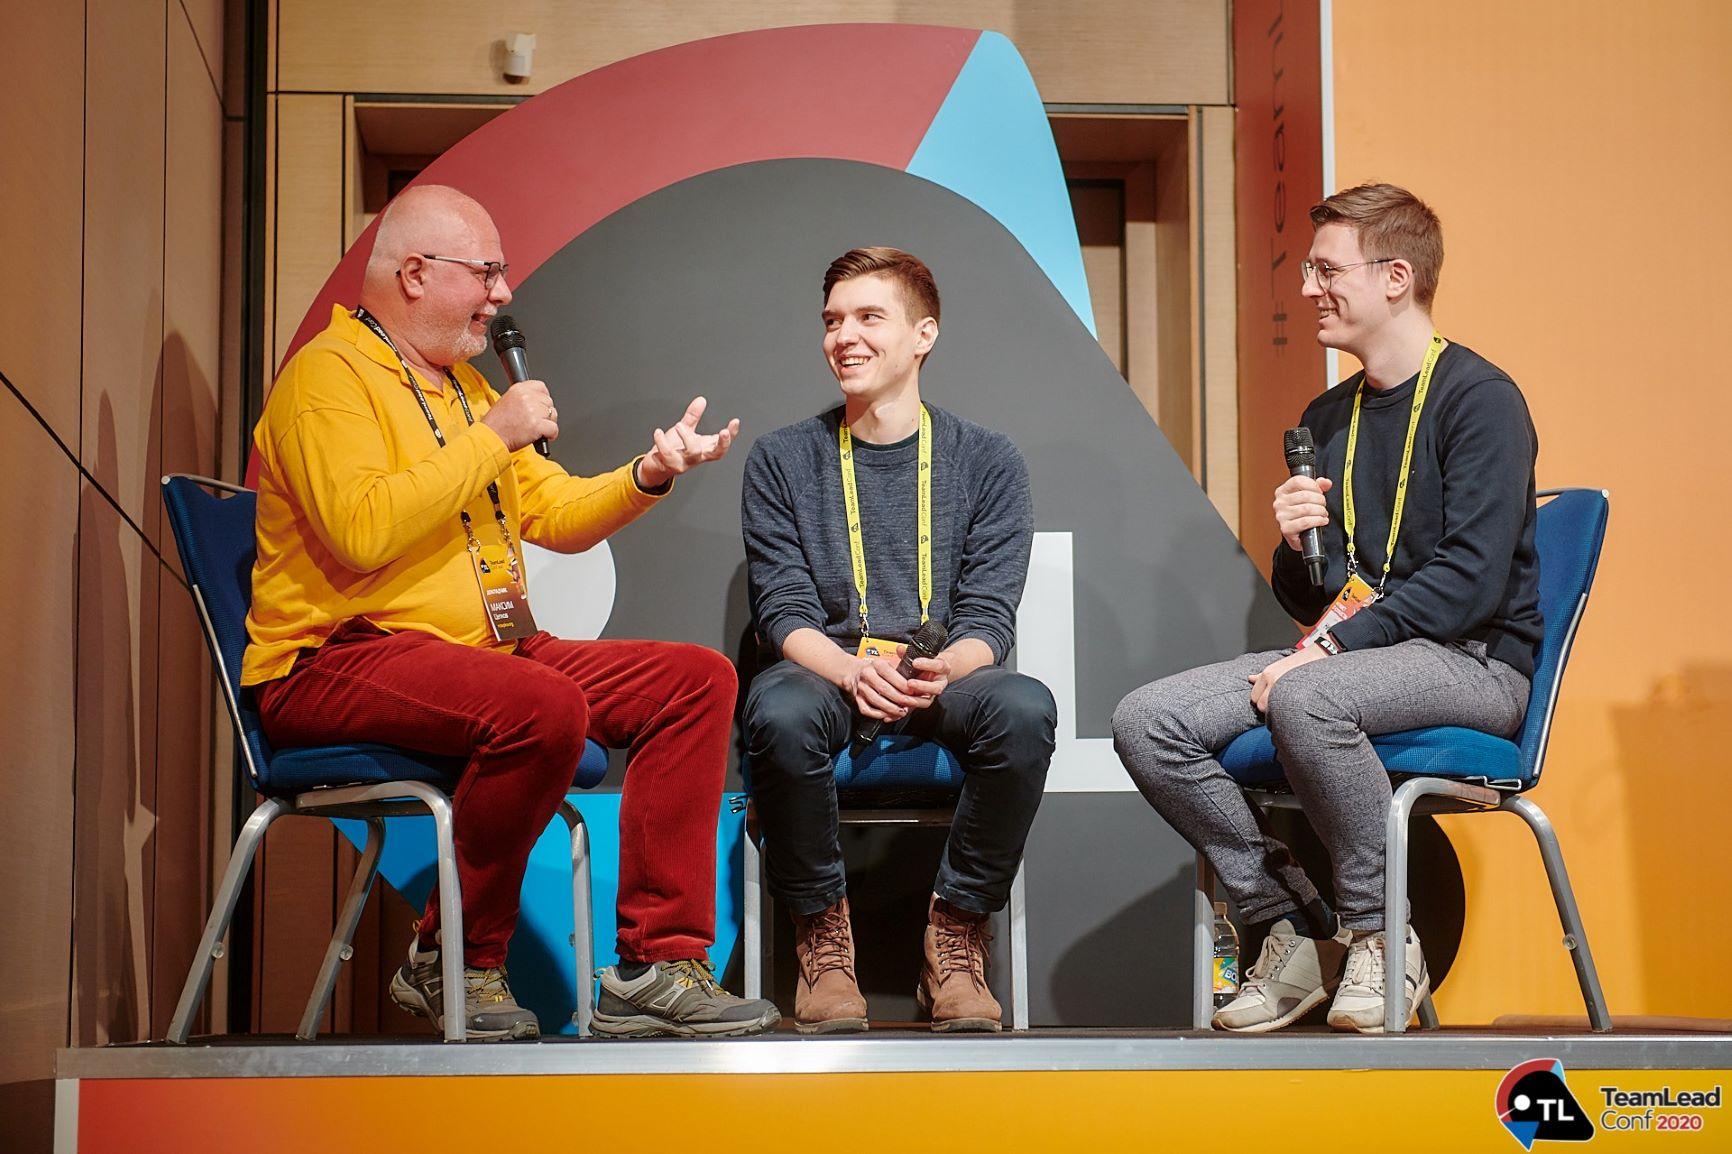 «Больше интерактива!» или Как прошел TeamLead Conf 2020 - 17